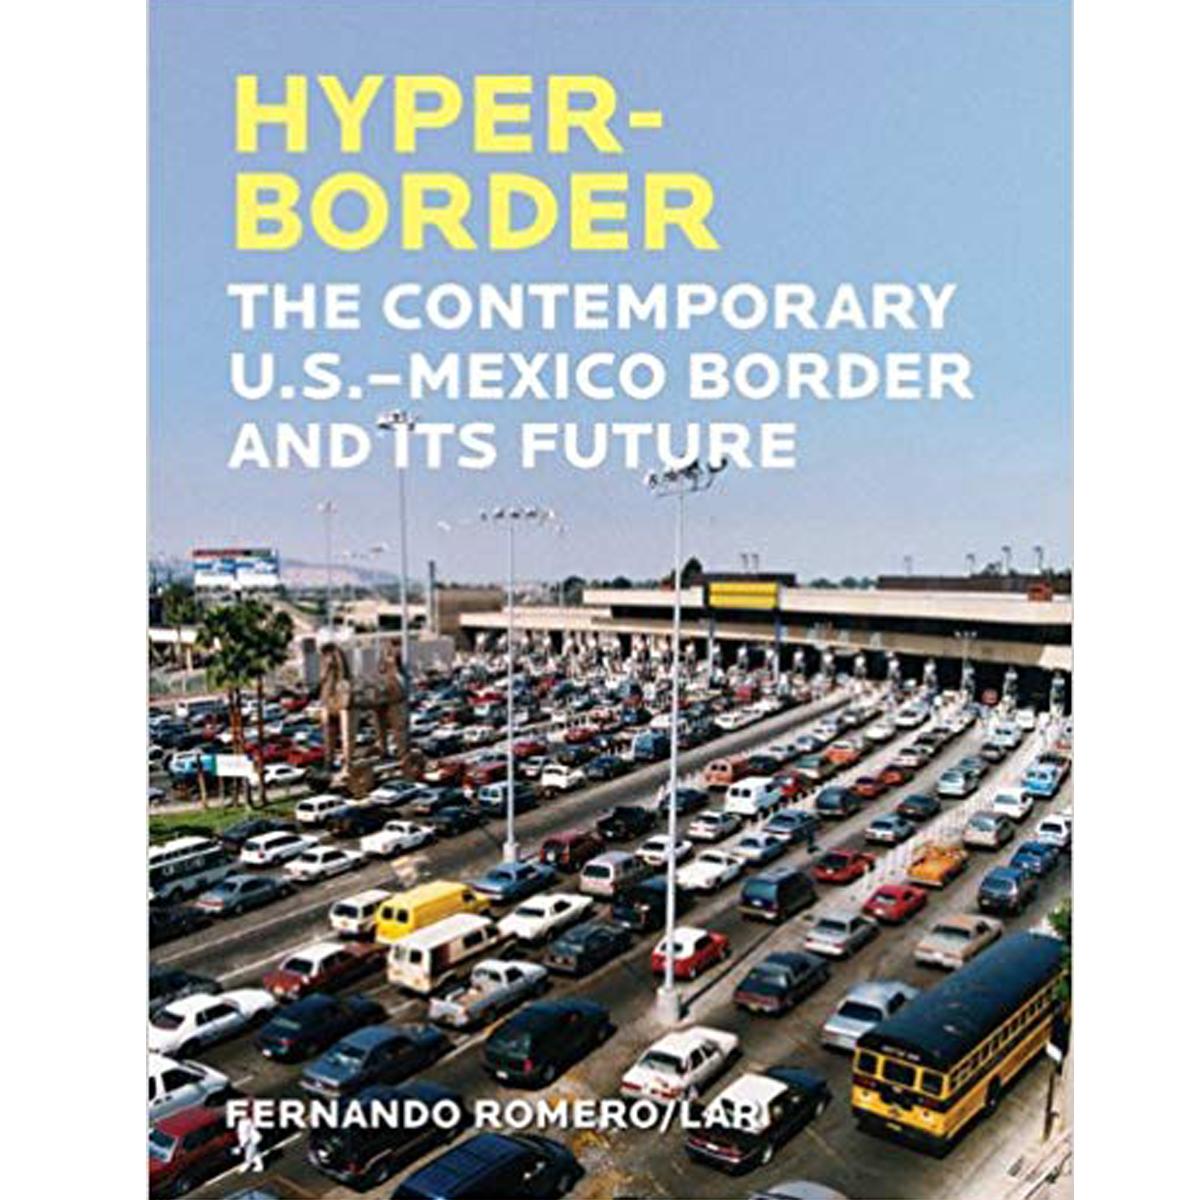 Hyper-border